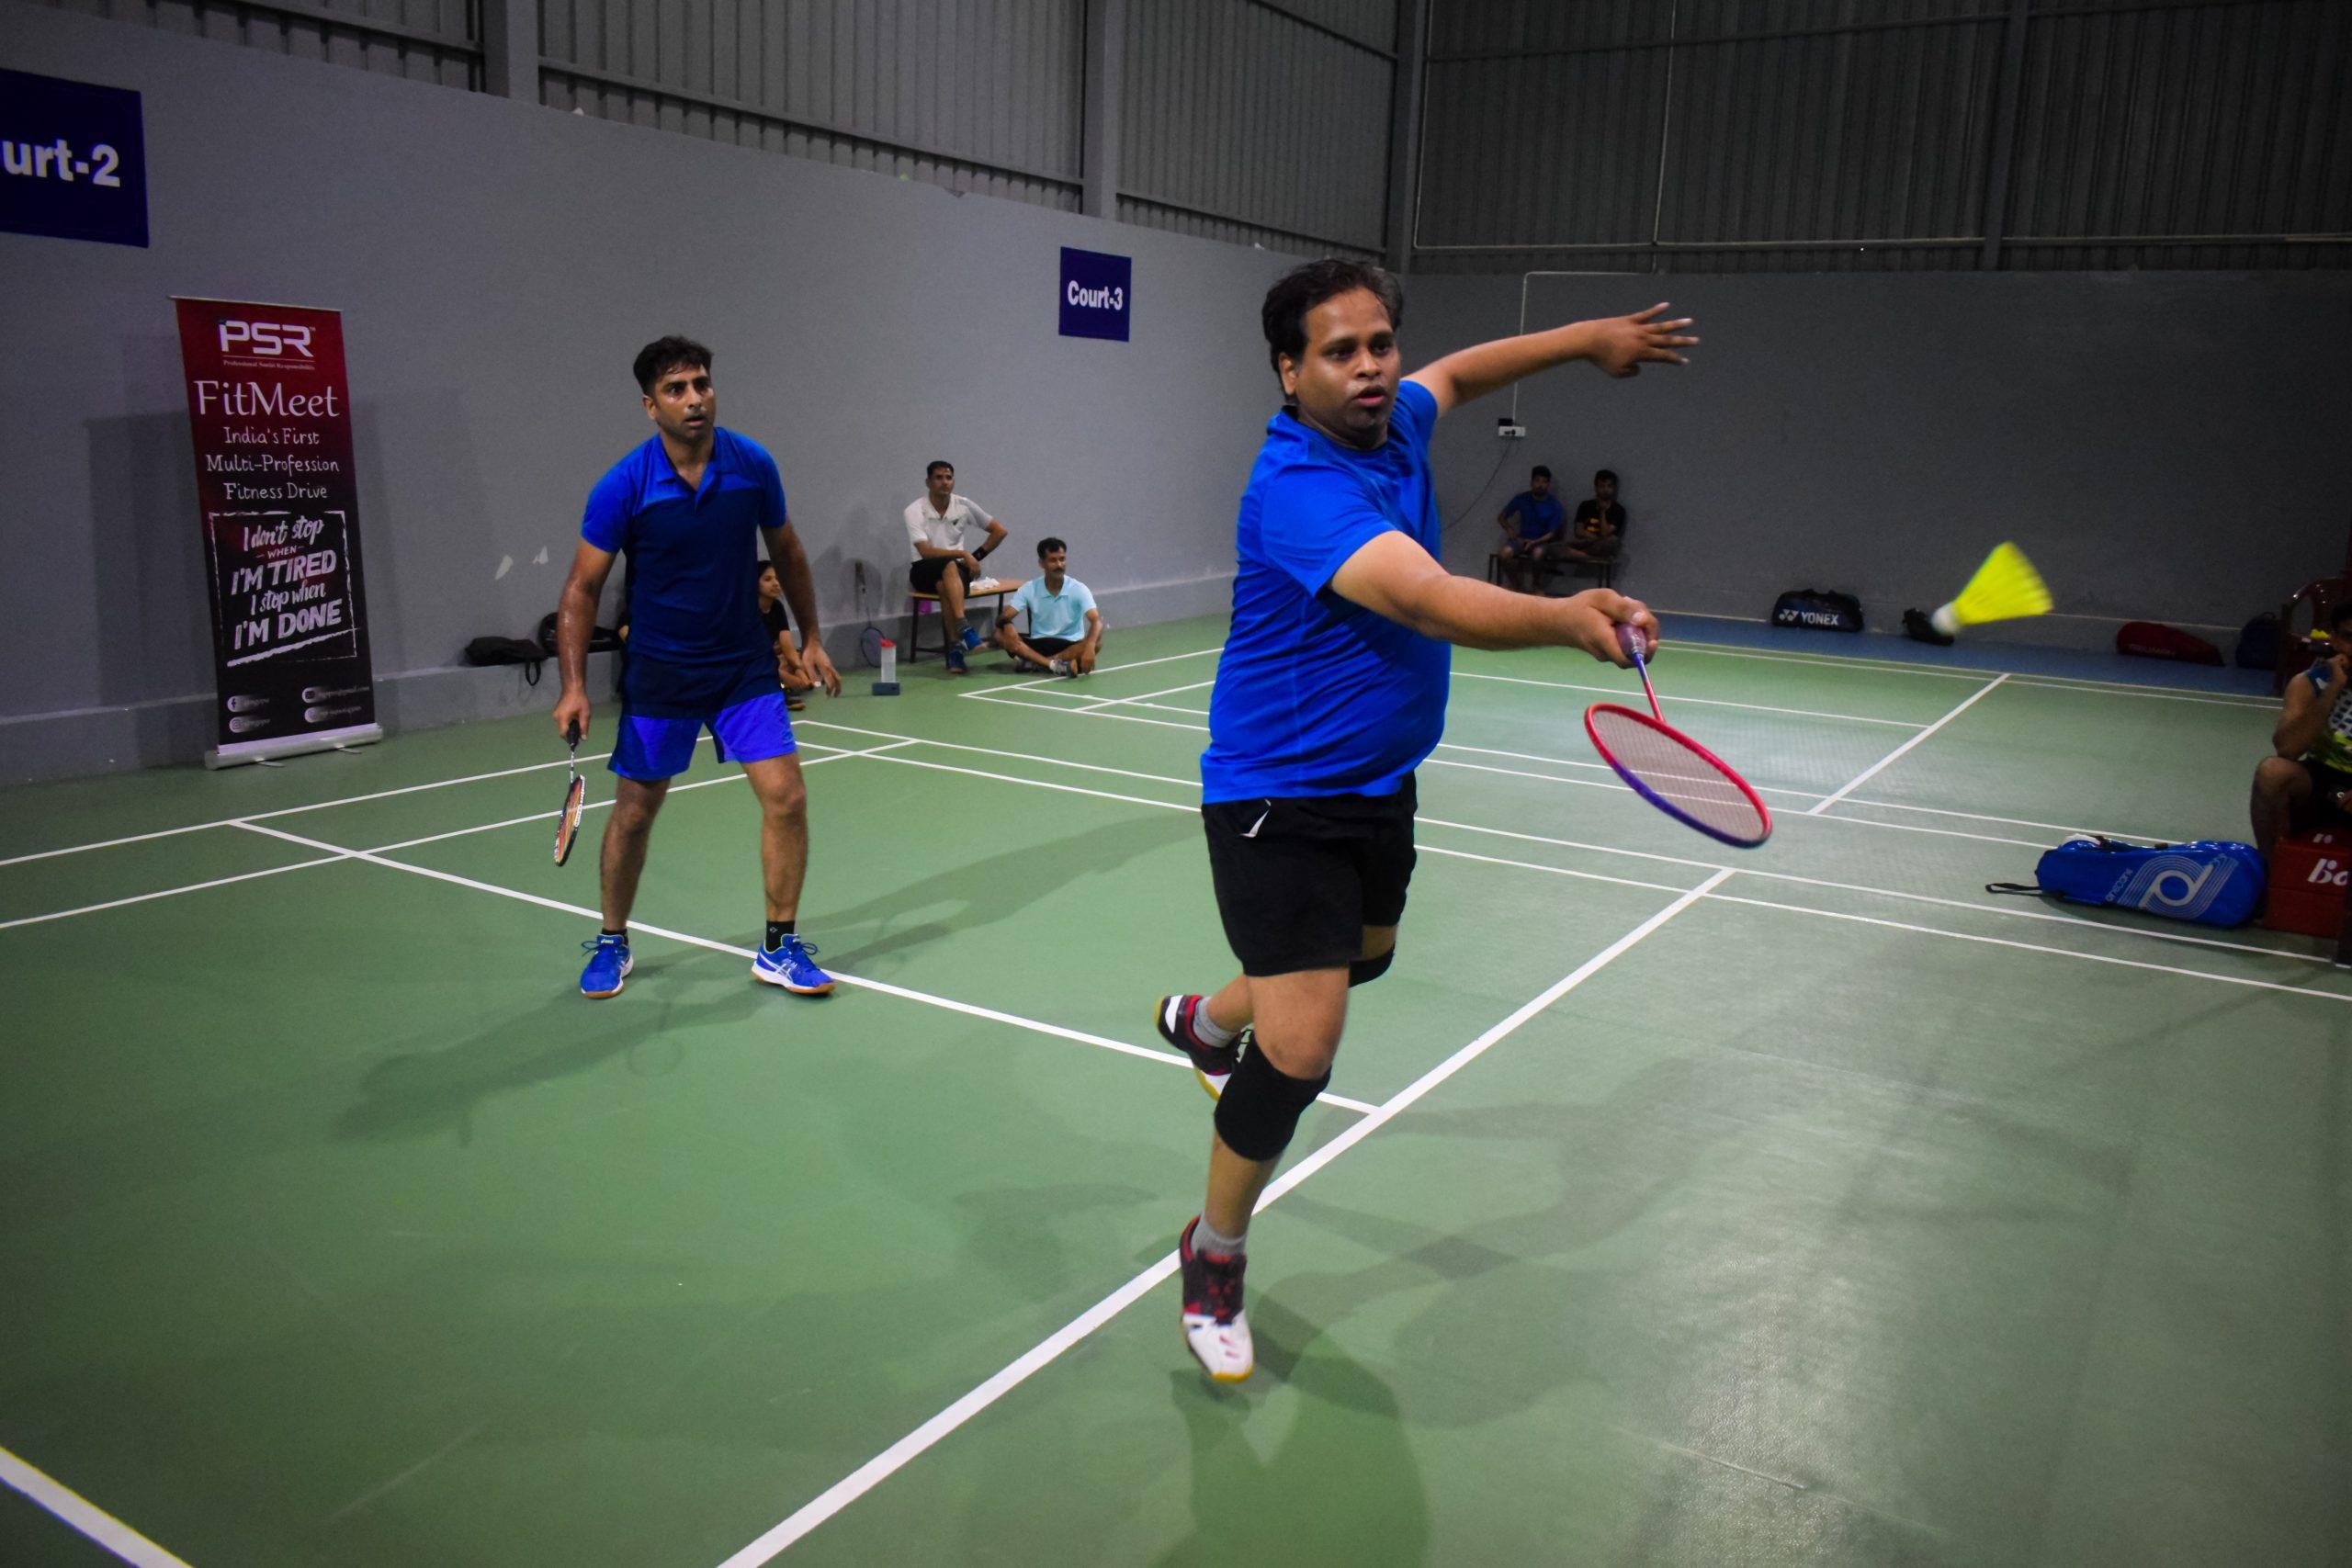 People playing badminton.